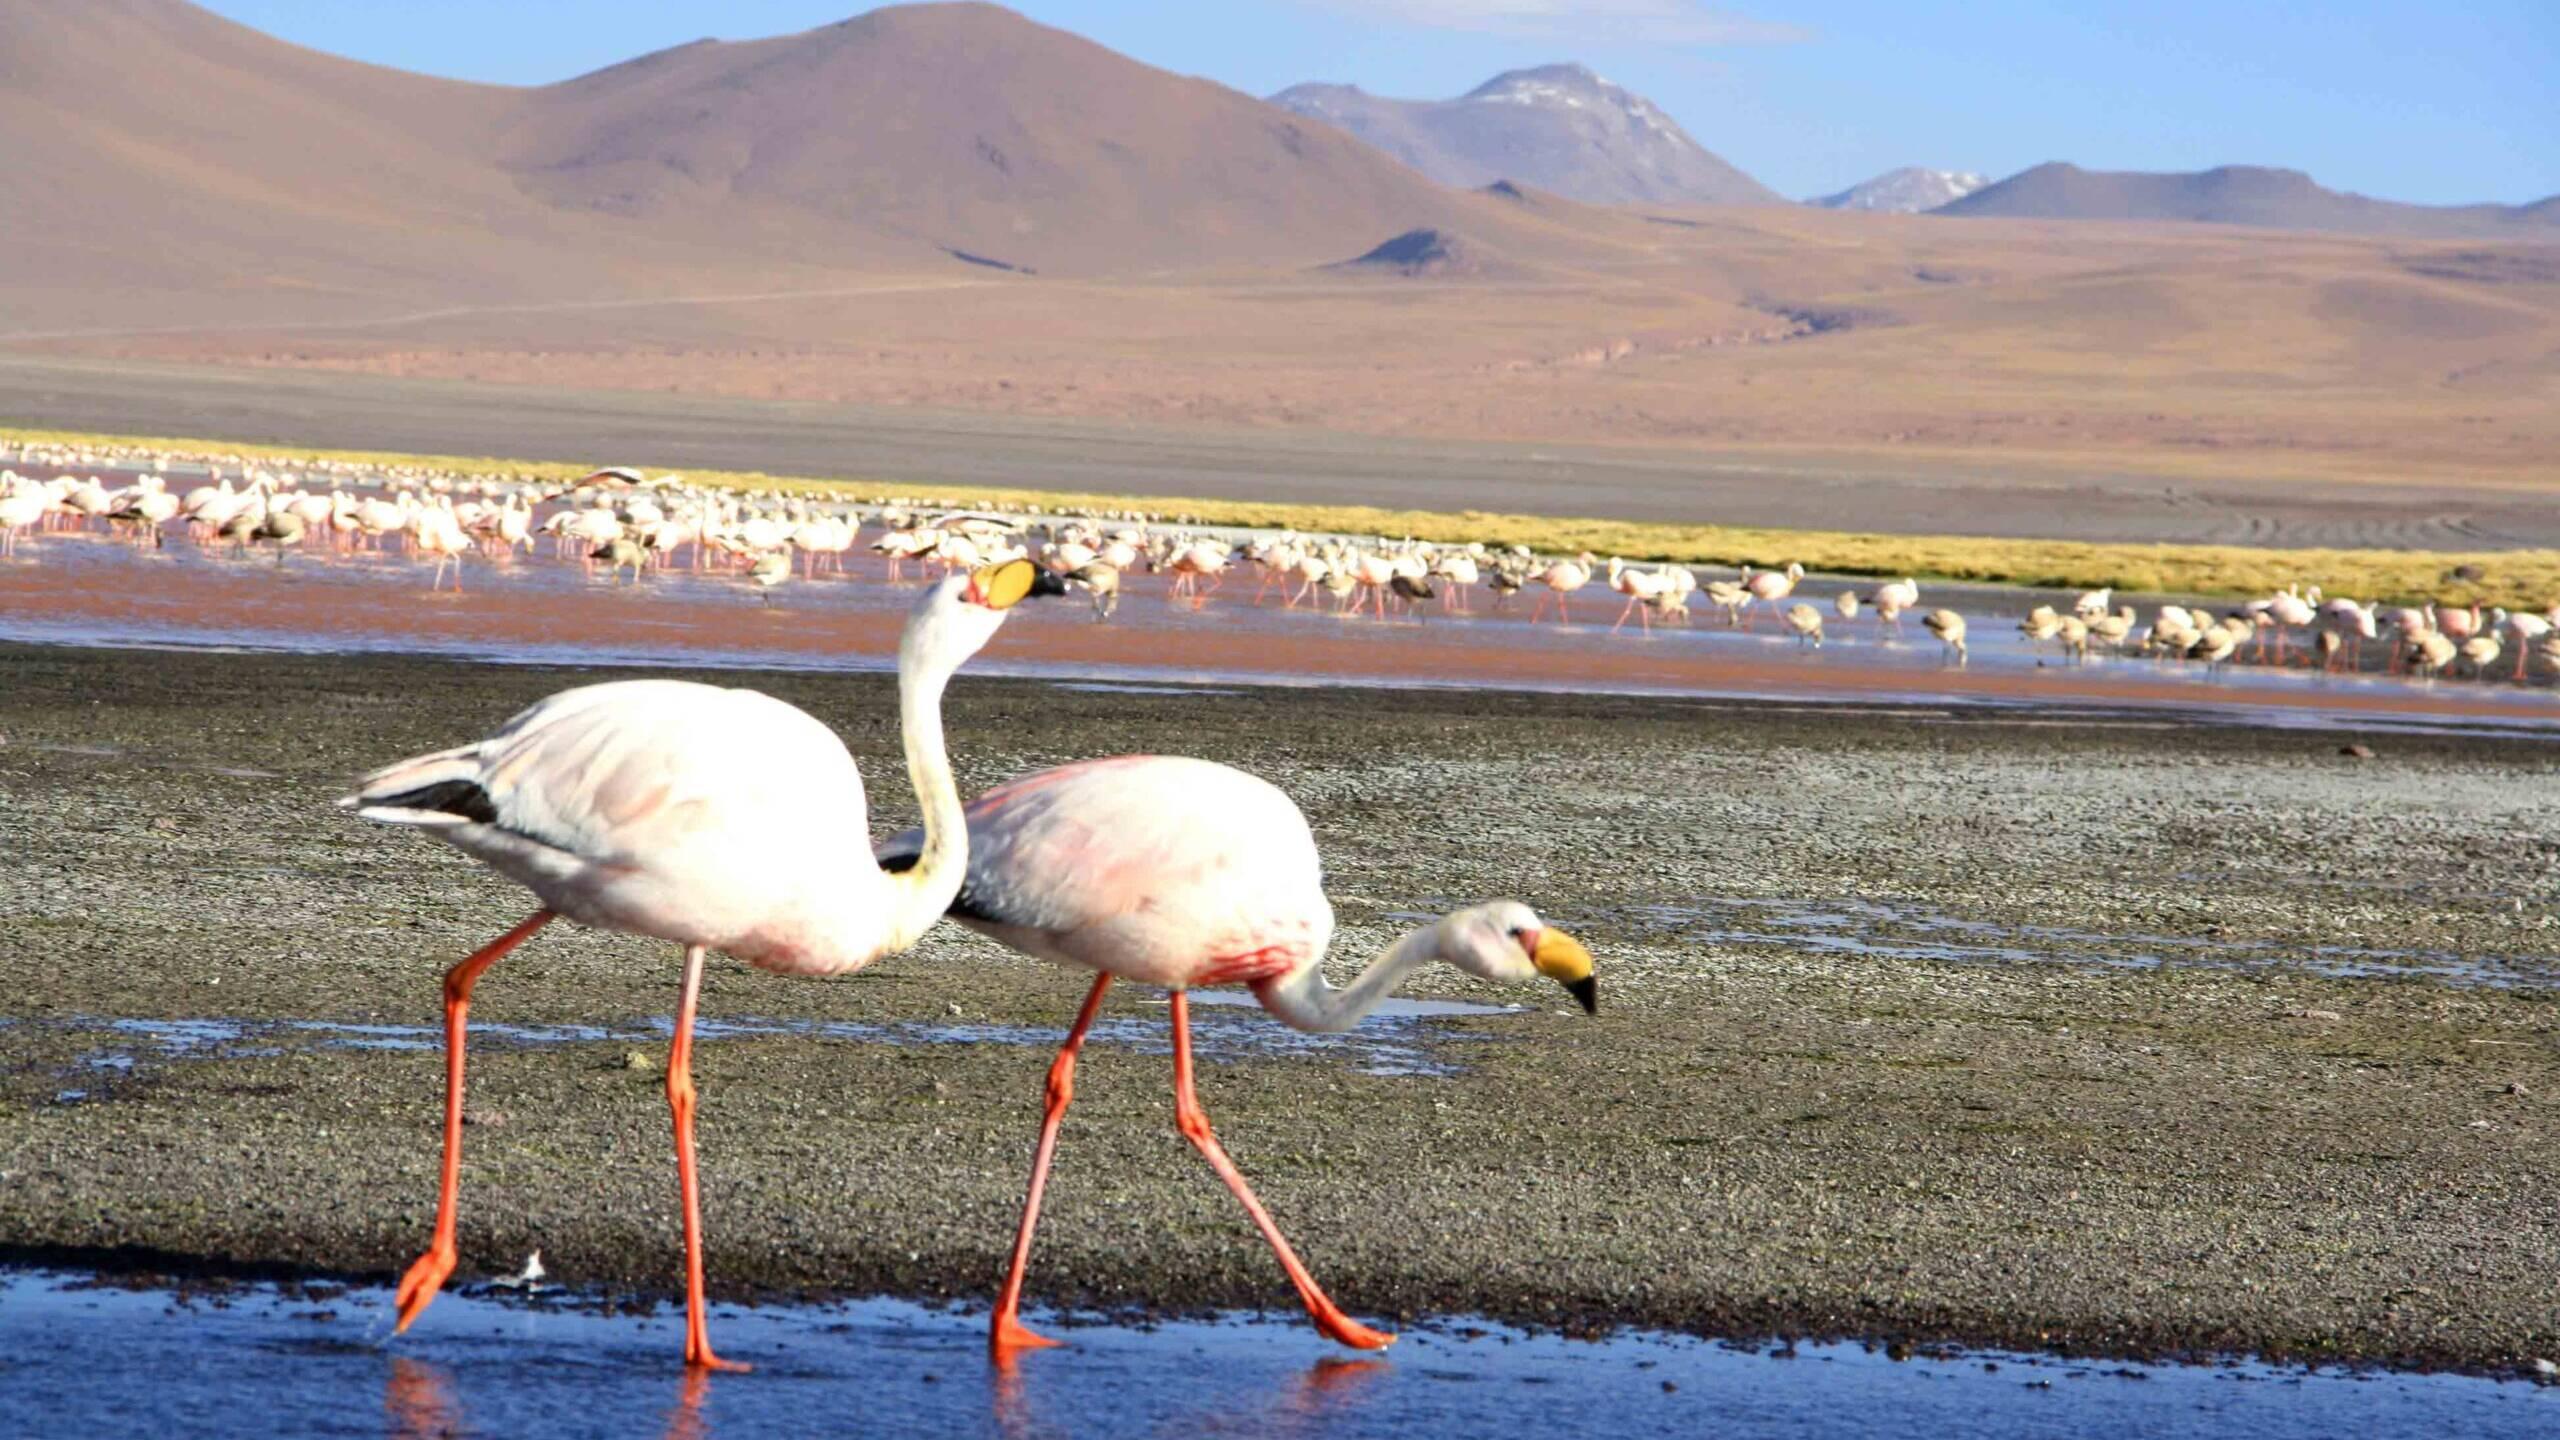 flamigos lake colorado view